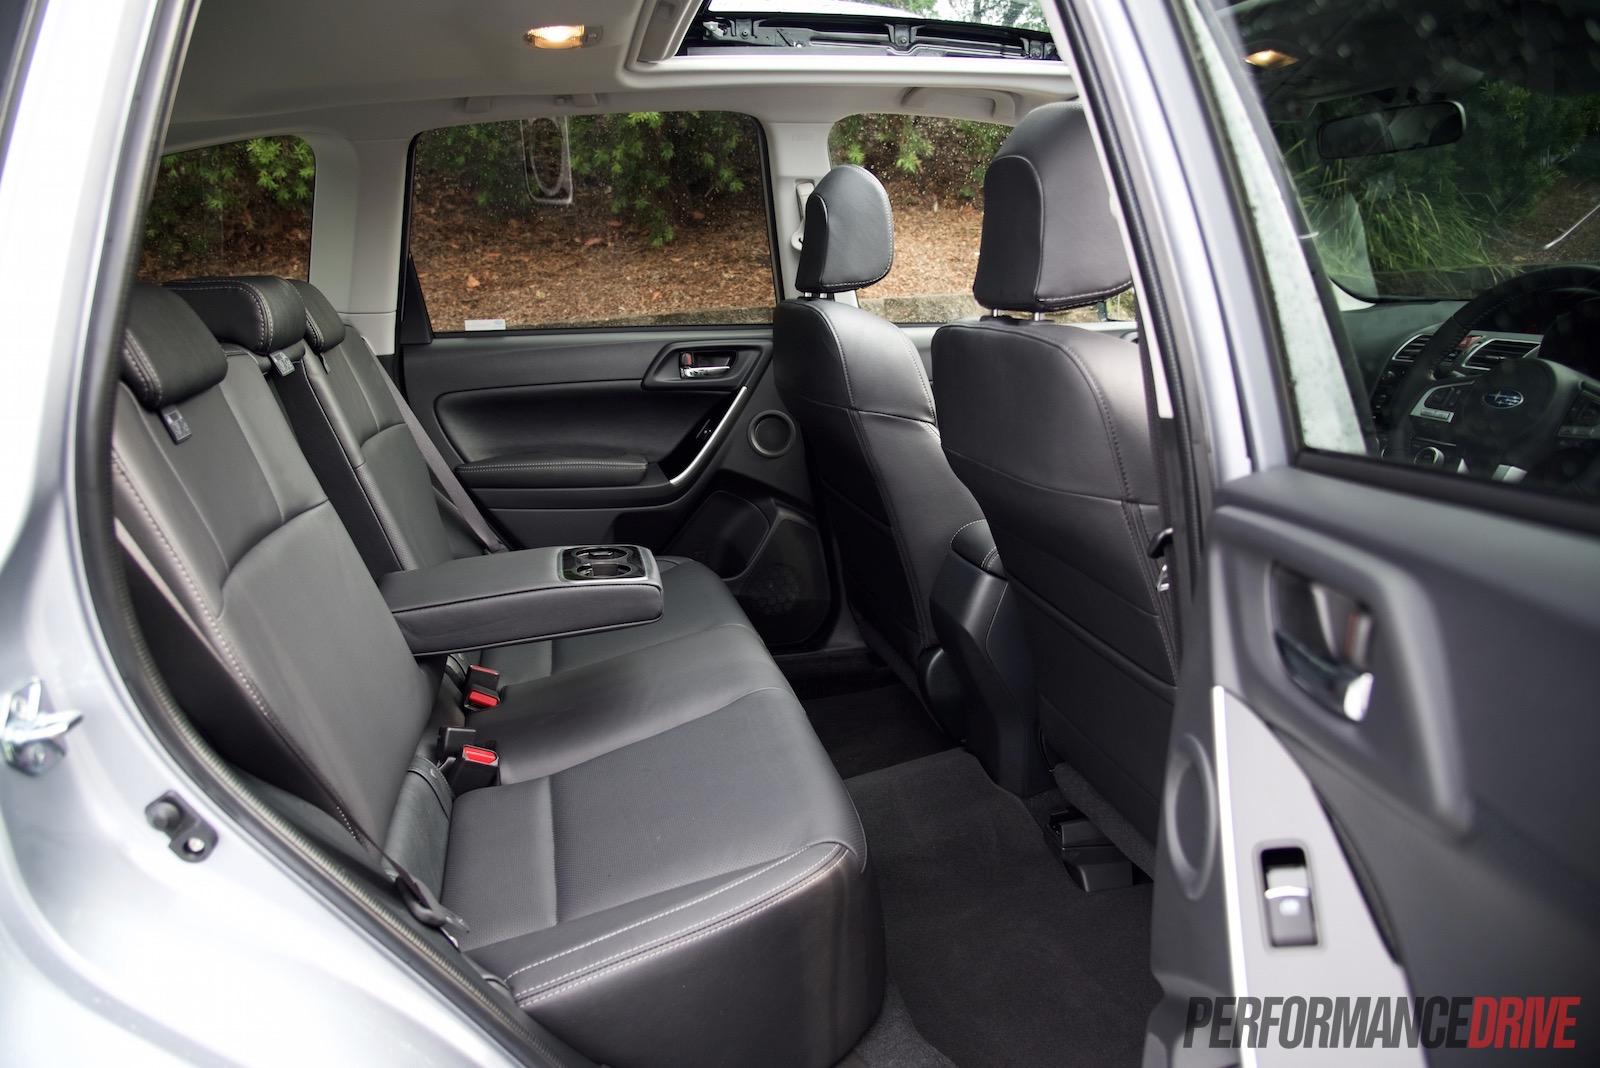 2016 Subaru Forester Xt Premium Review Video Performancedrive Fuel Filter Rear Seats